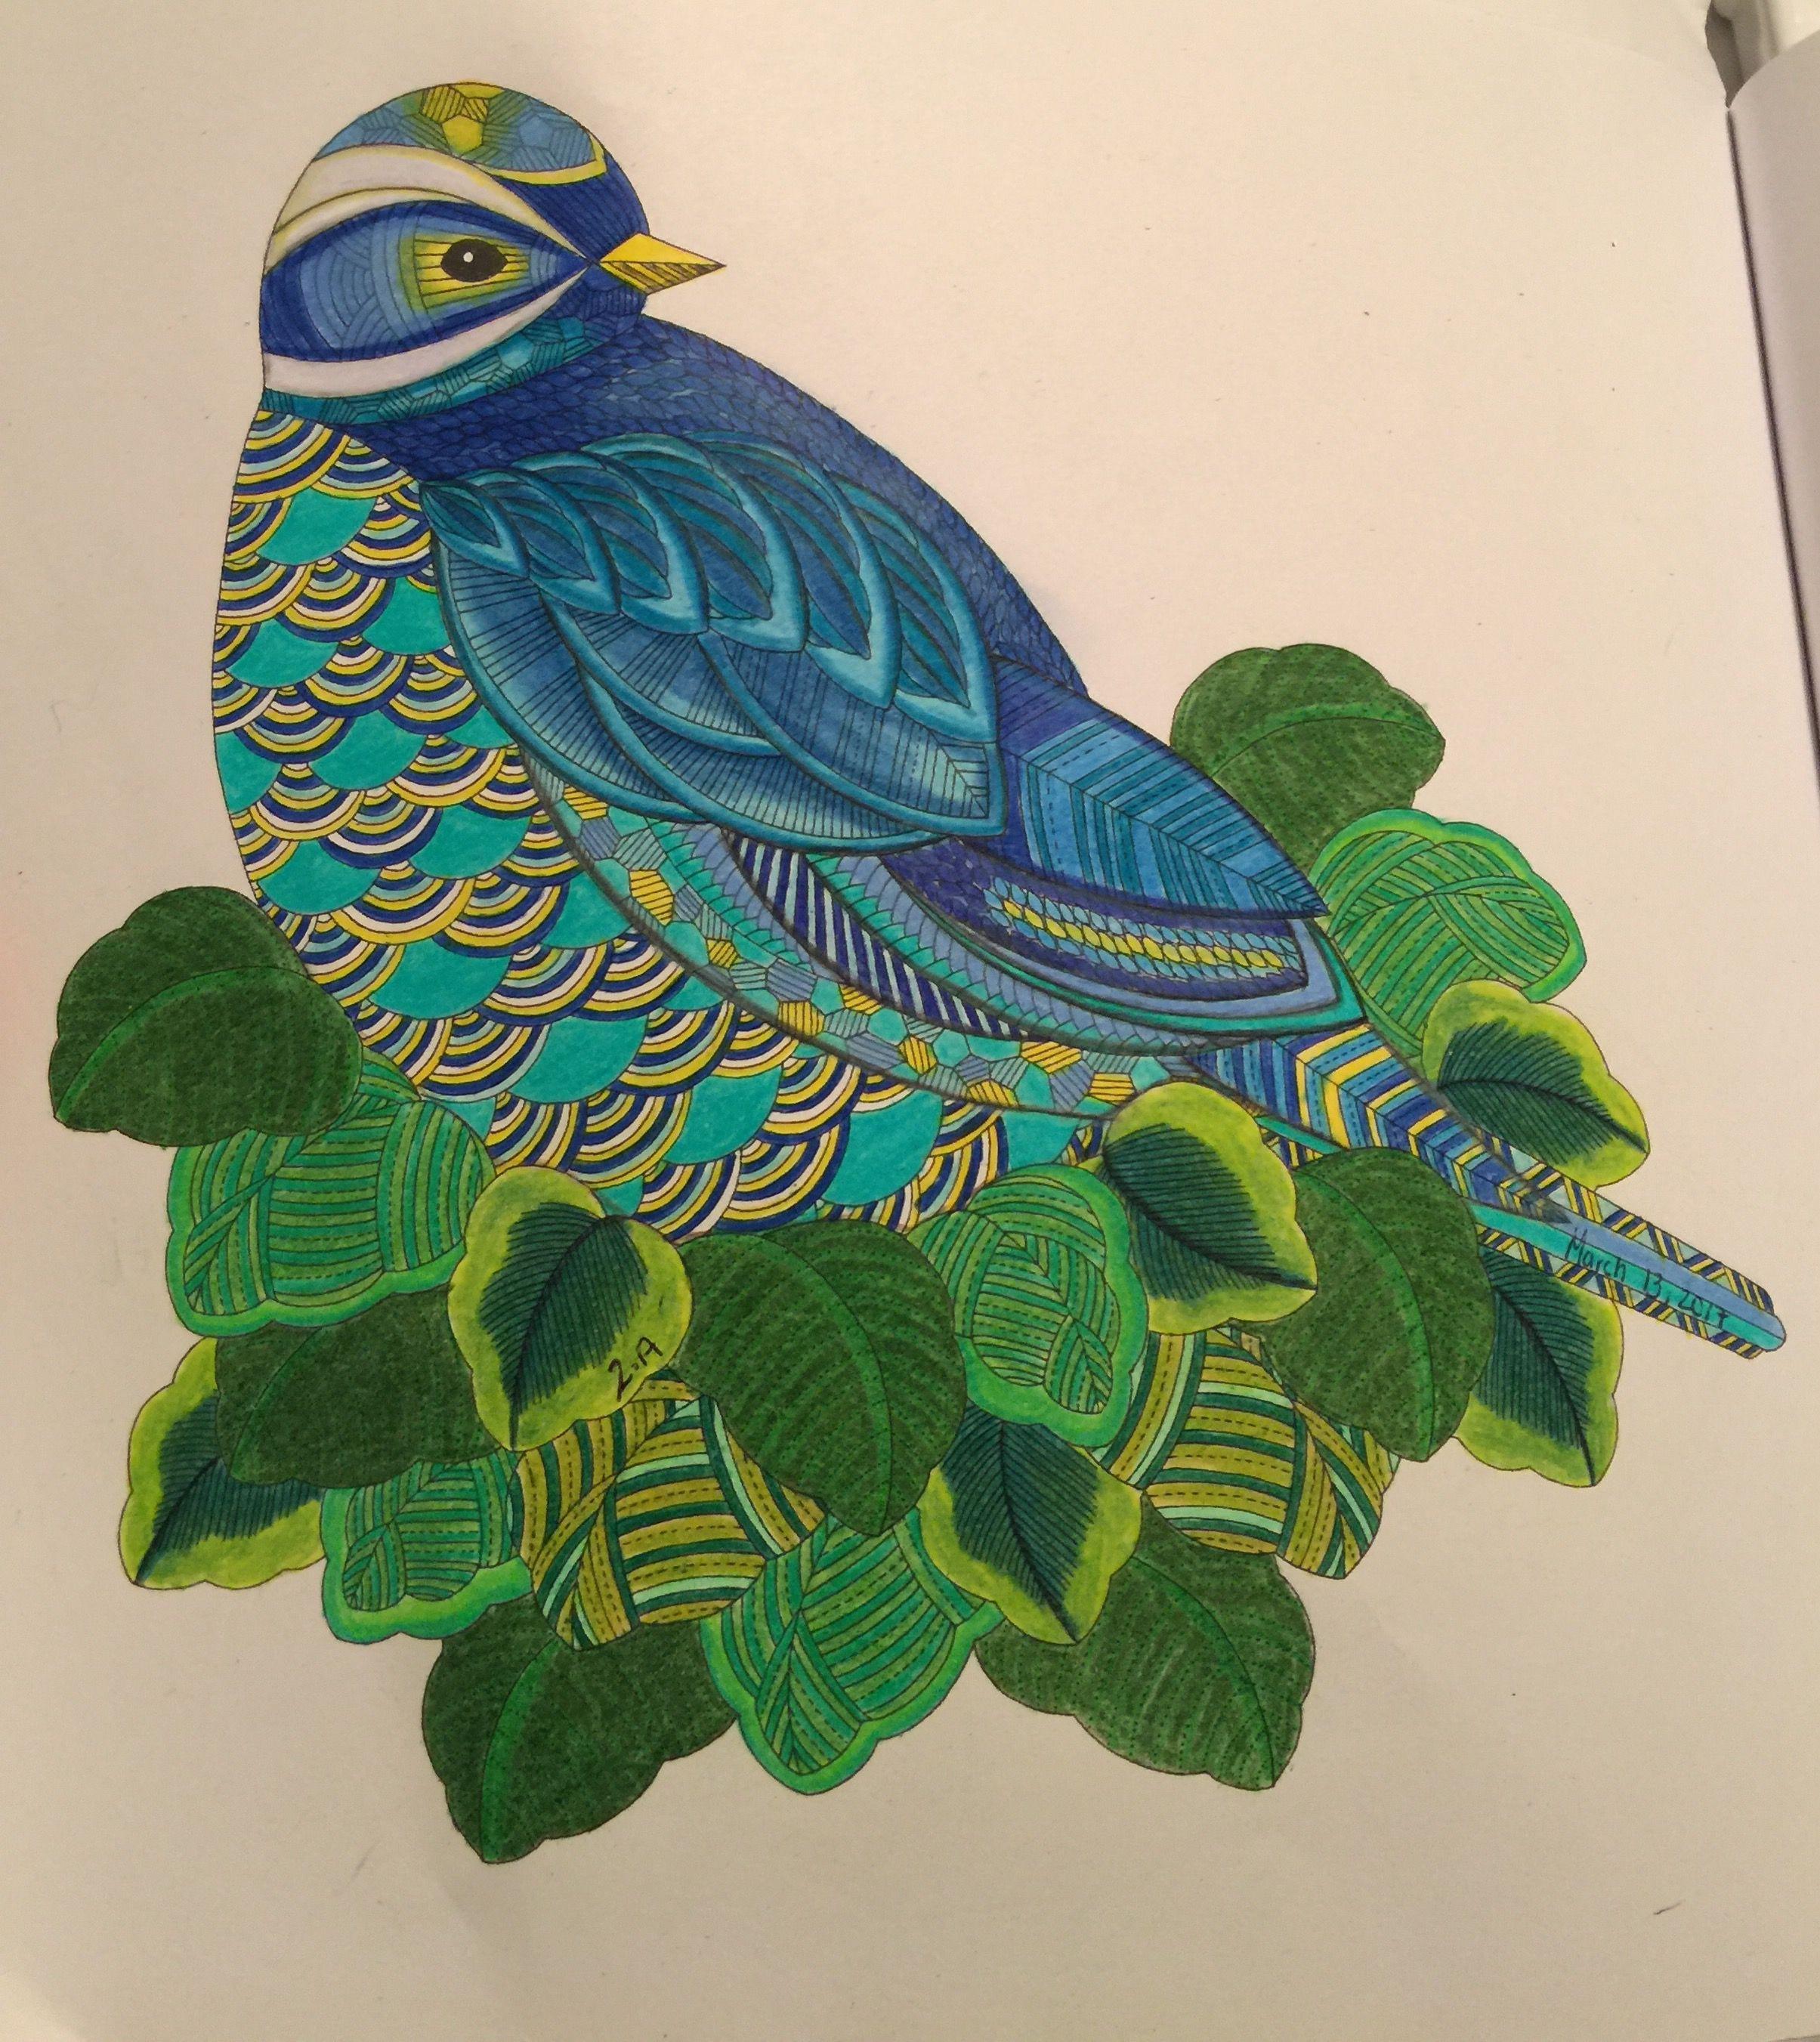 Animal Kingdom Millie Marotta Birds Color Me Draw Bird Coloring Book Moth Millie Marotta Art Coloring Books